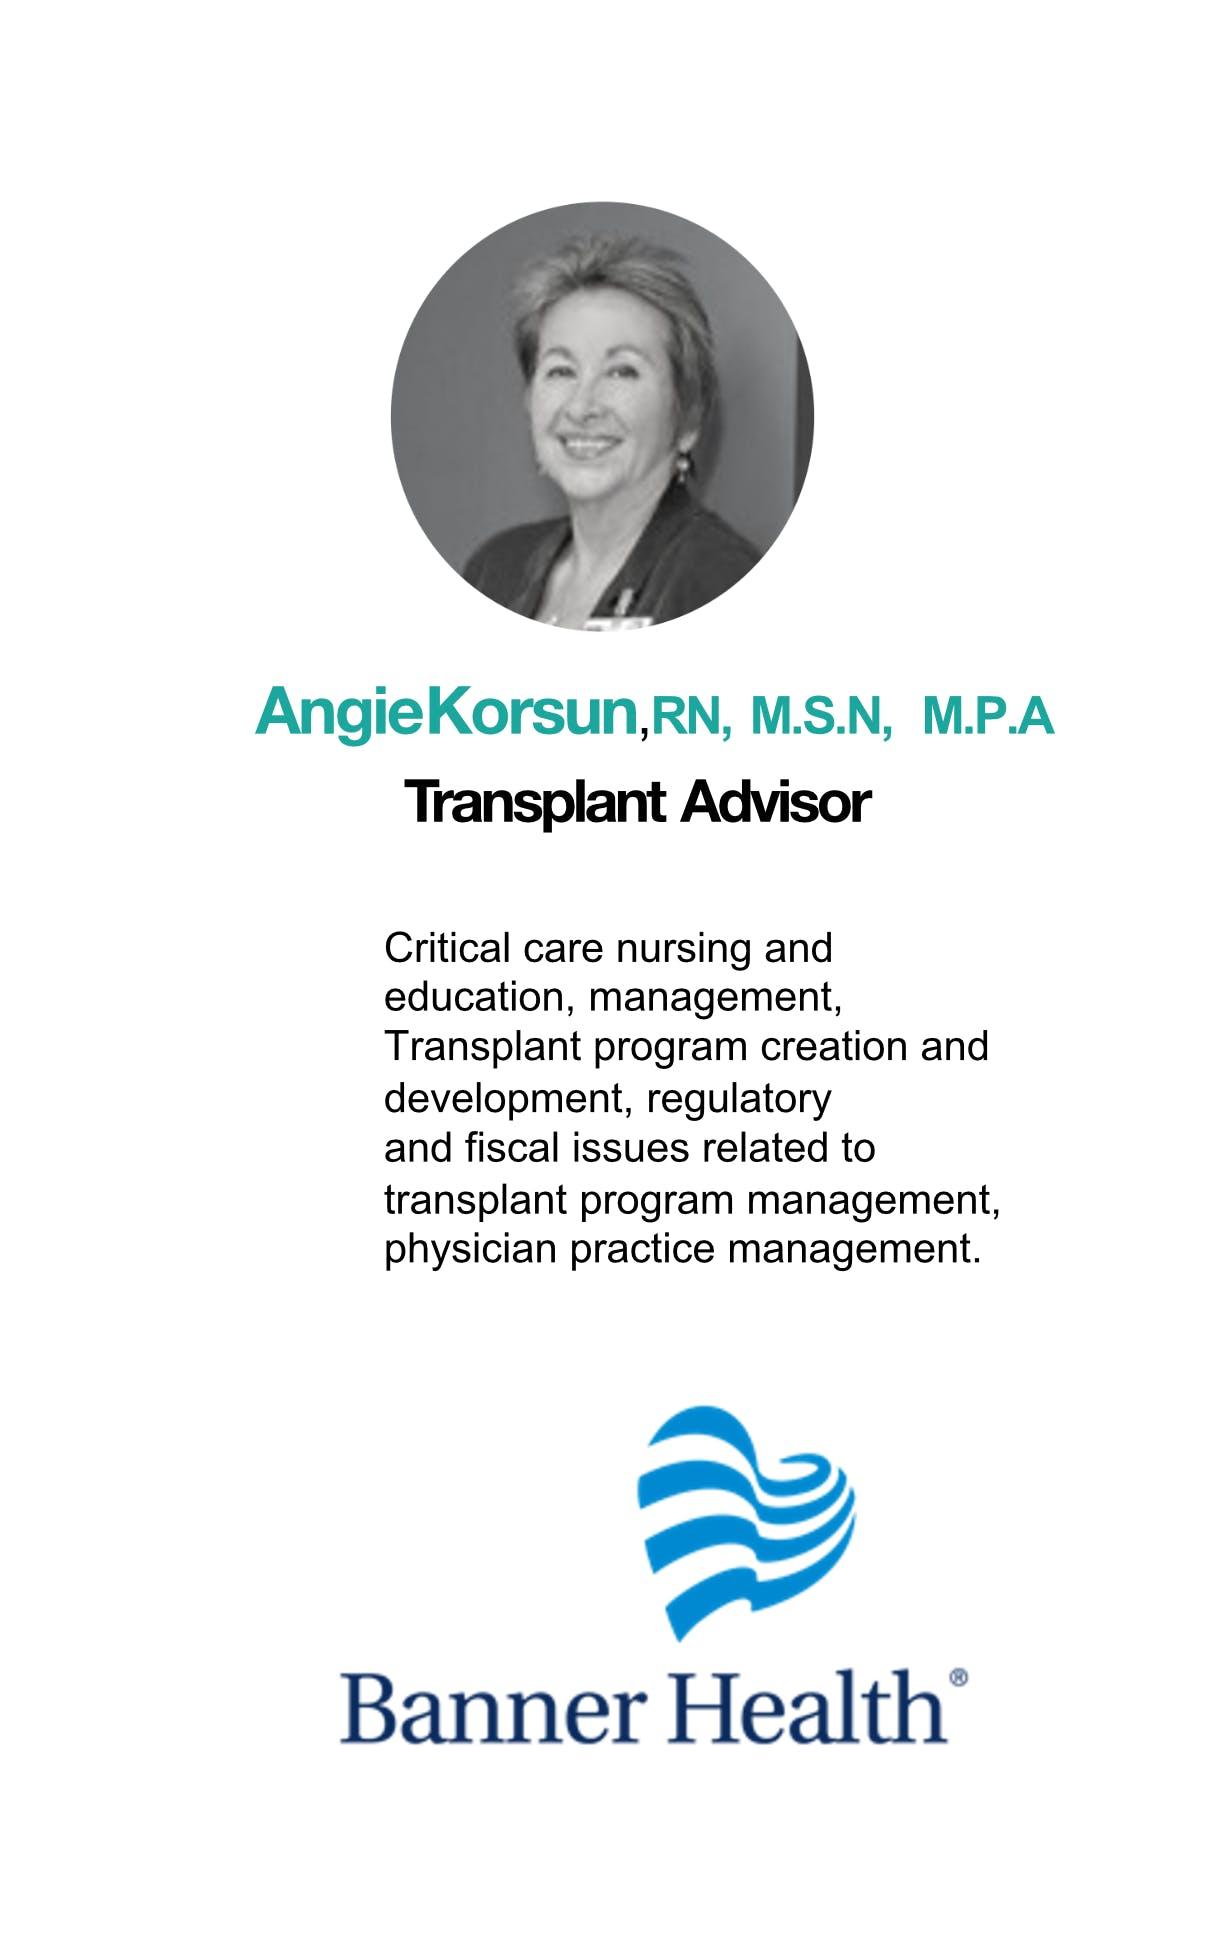 Angie Korsun, RN, MSN, MPA Transplant Advisor Banner Health